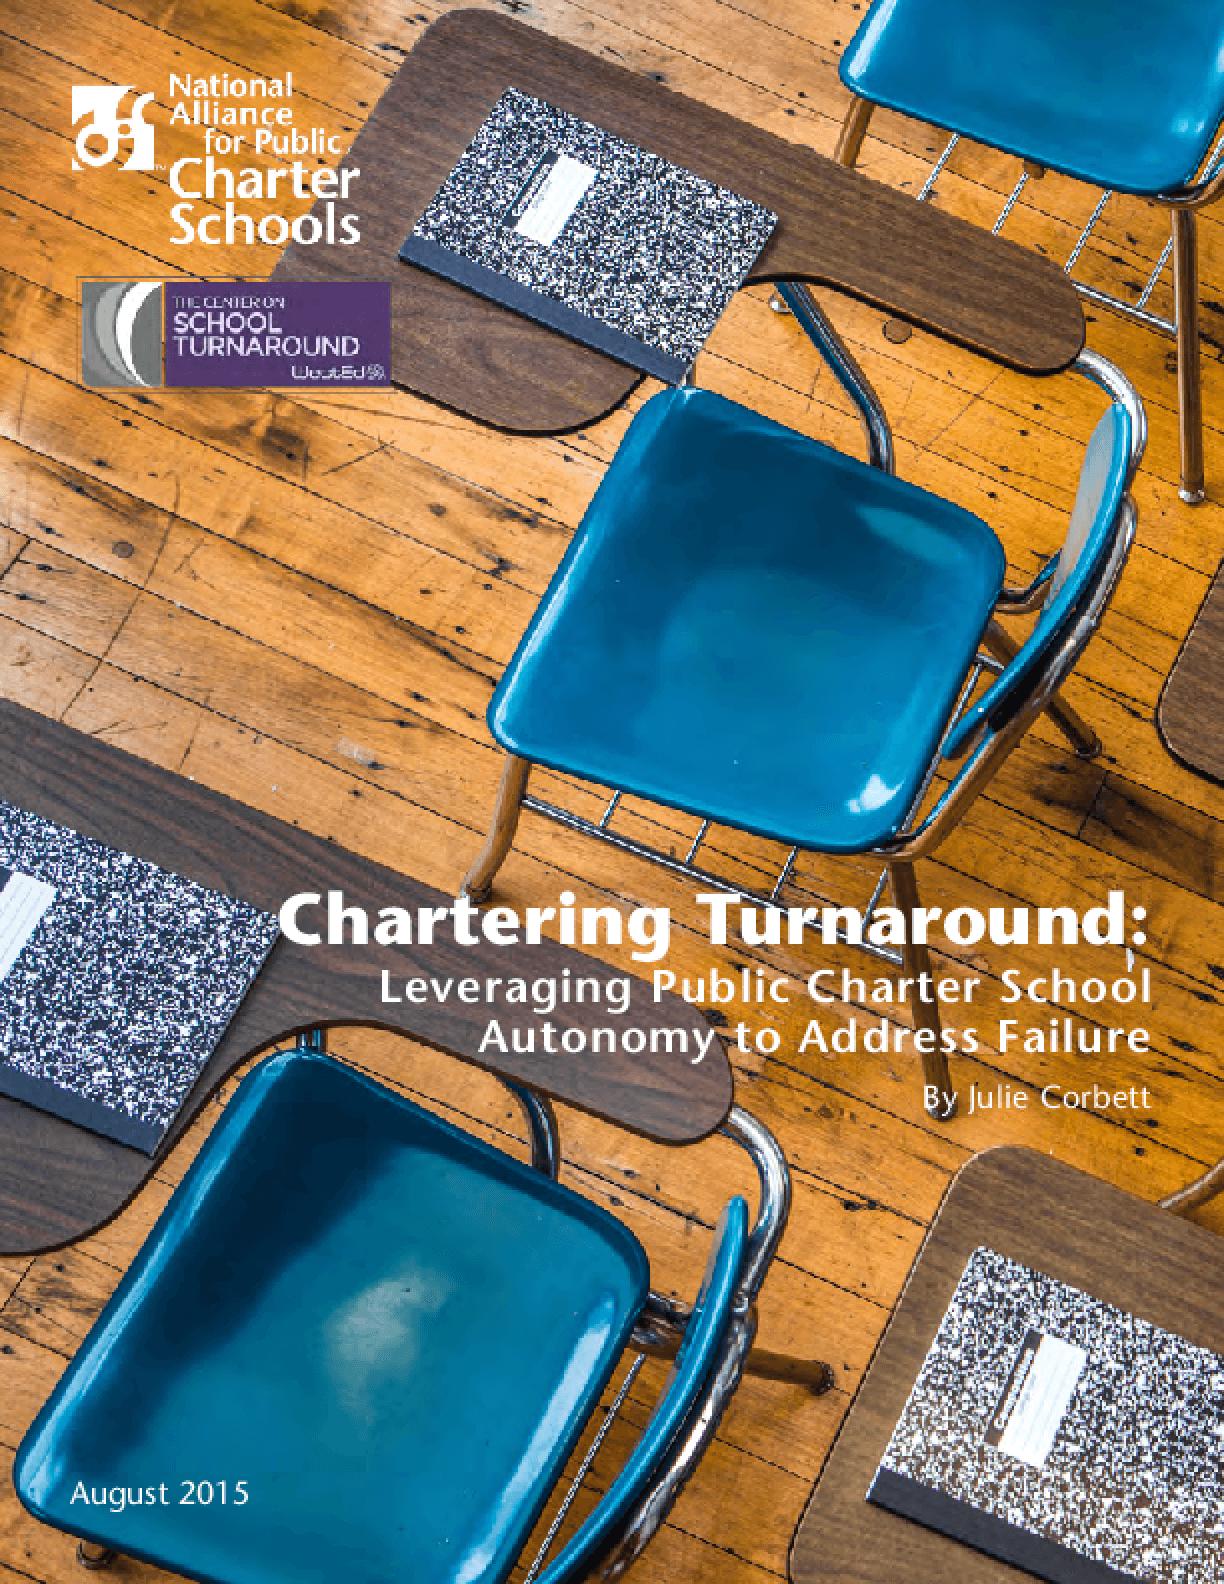 Chartering Turnaround: Leveraging Public Charter School Autonomy to Address Failure